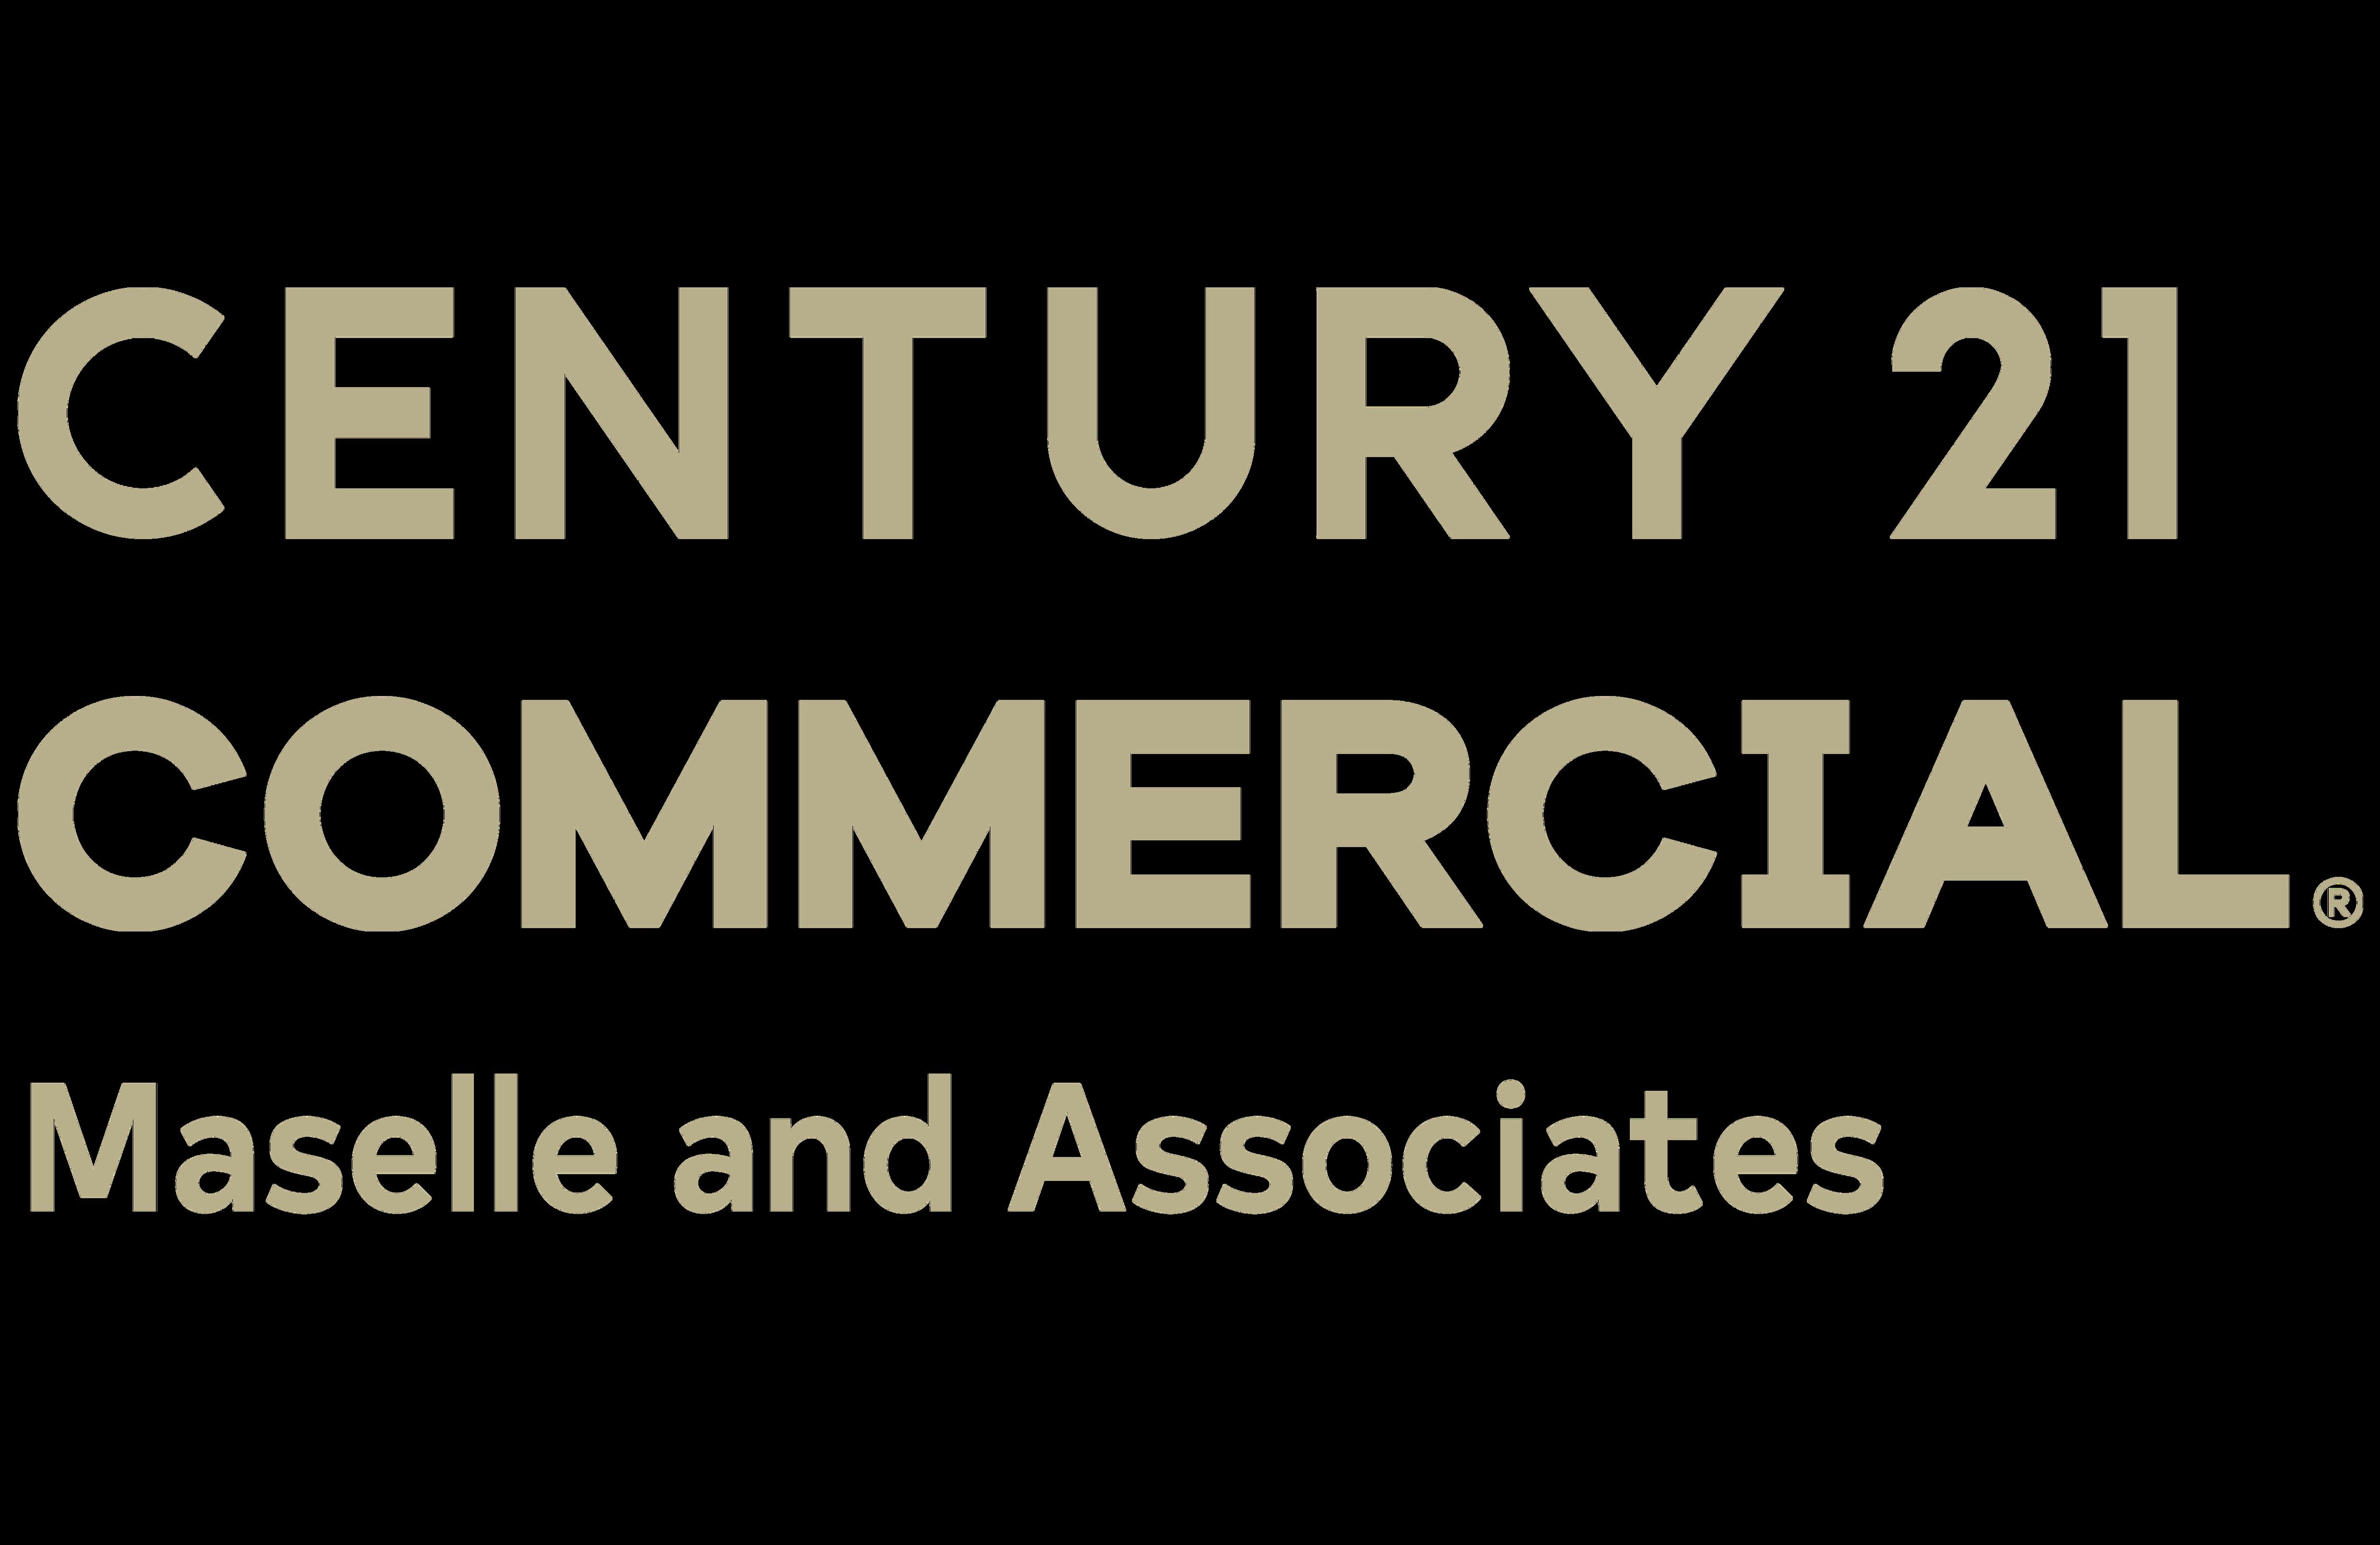 CENTURY 21 Maselle and Associates